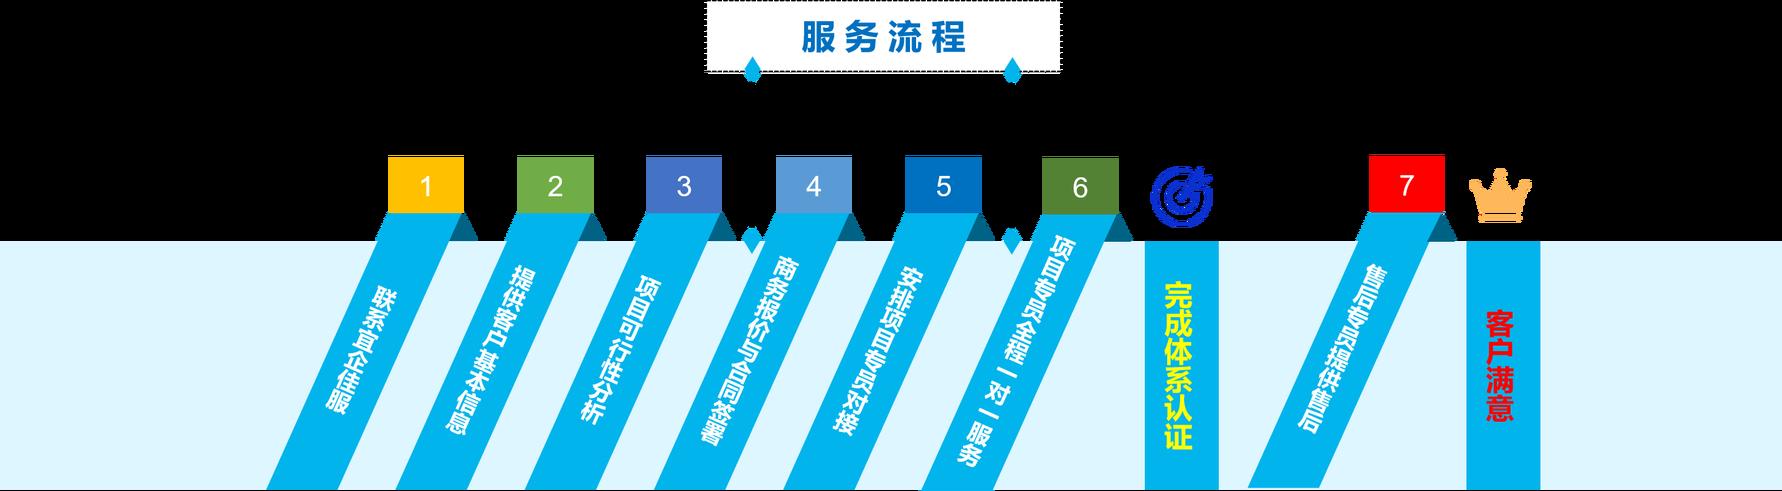 iso体系认证服务流程